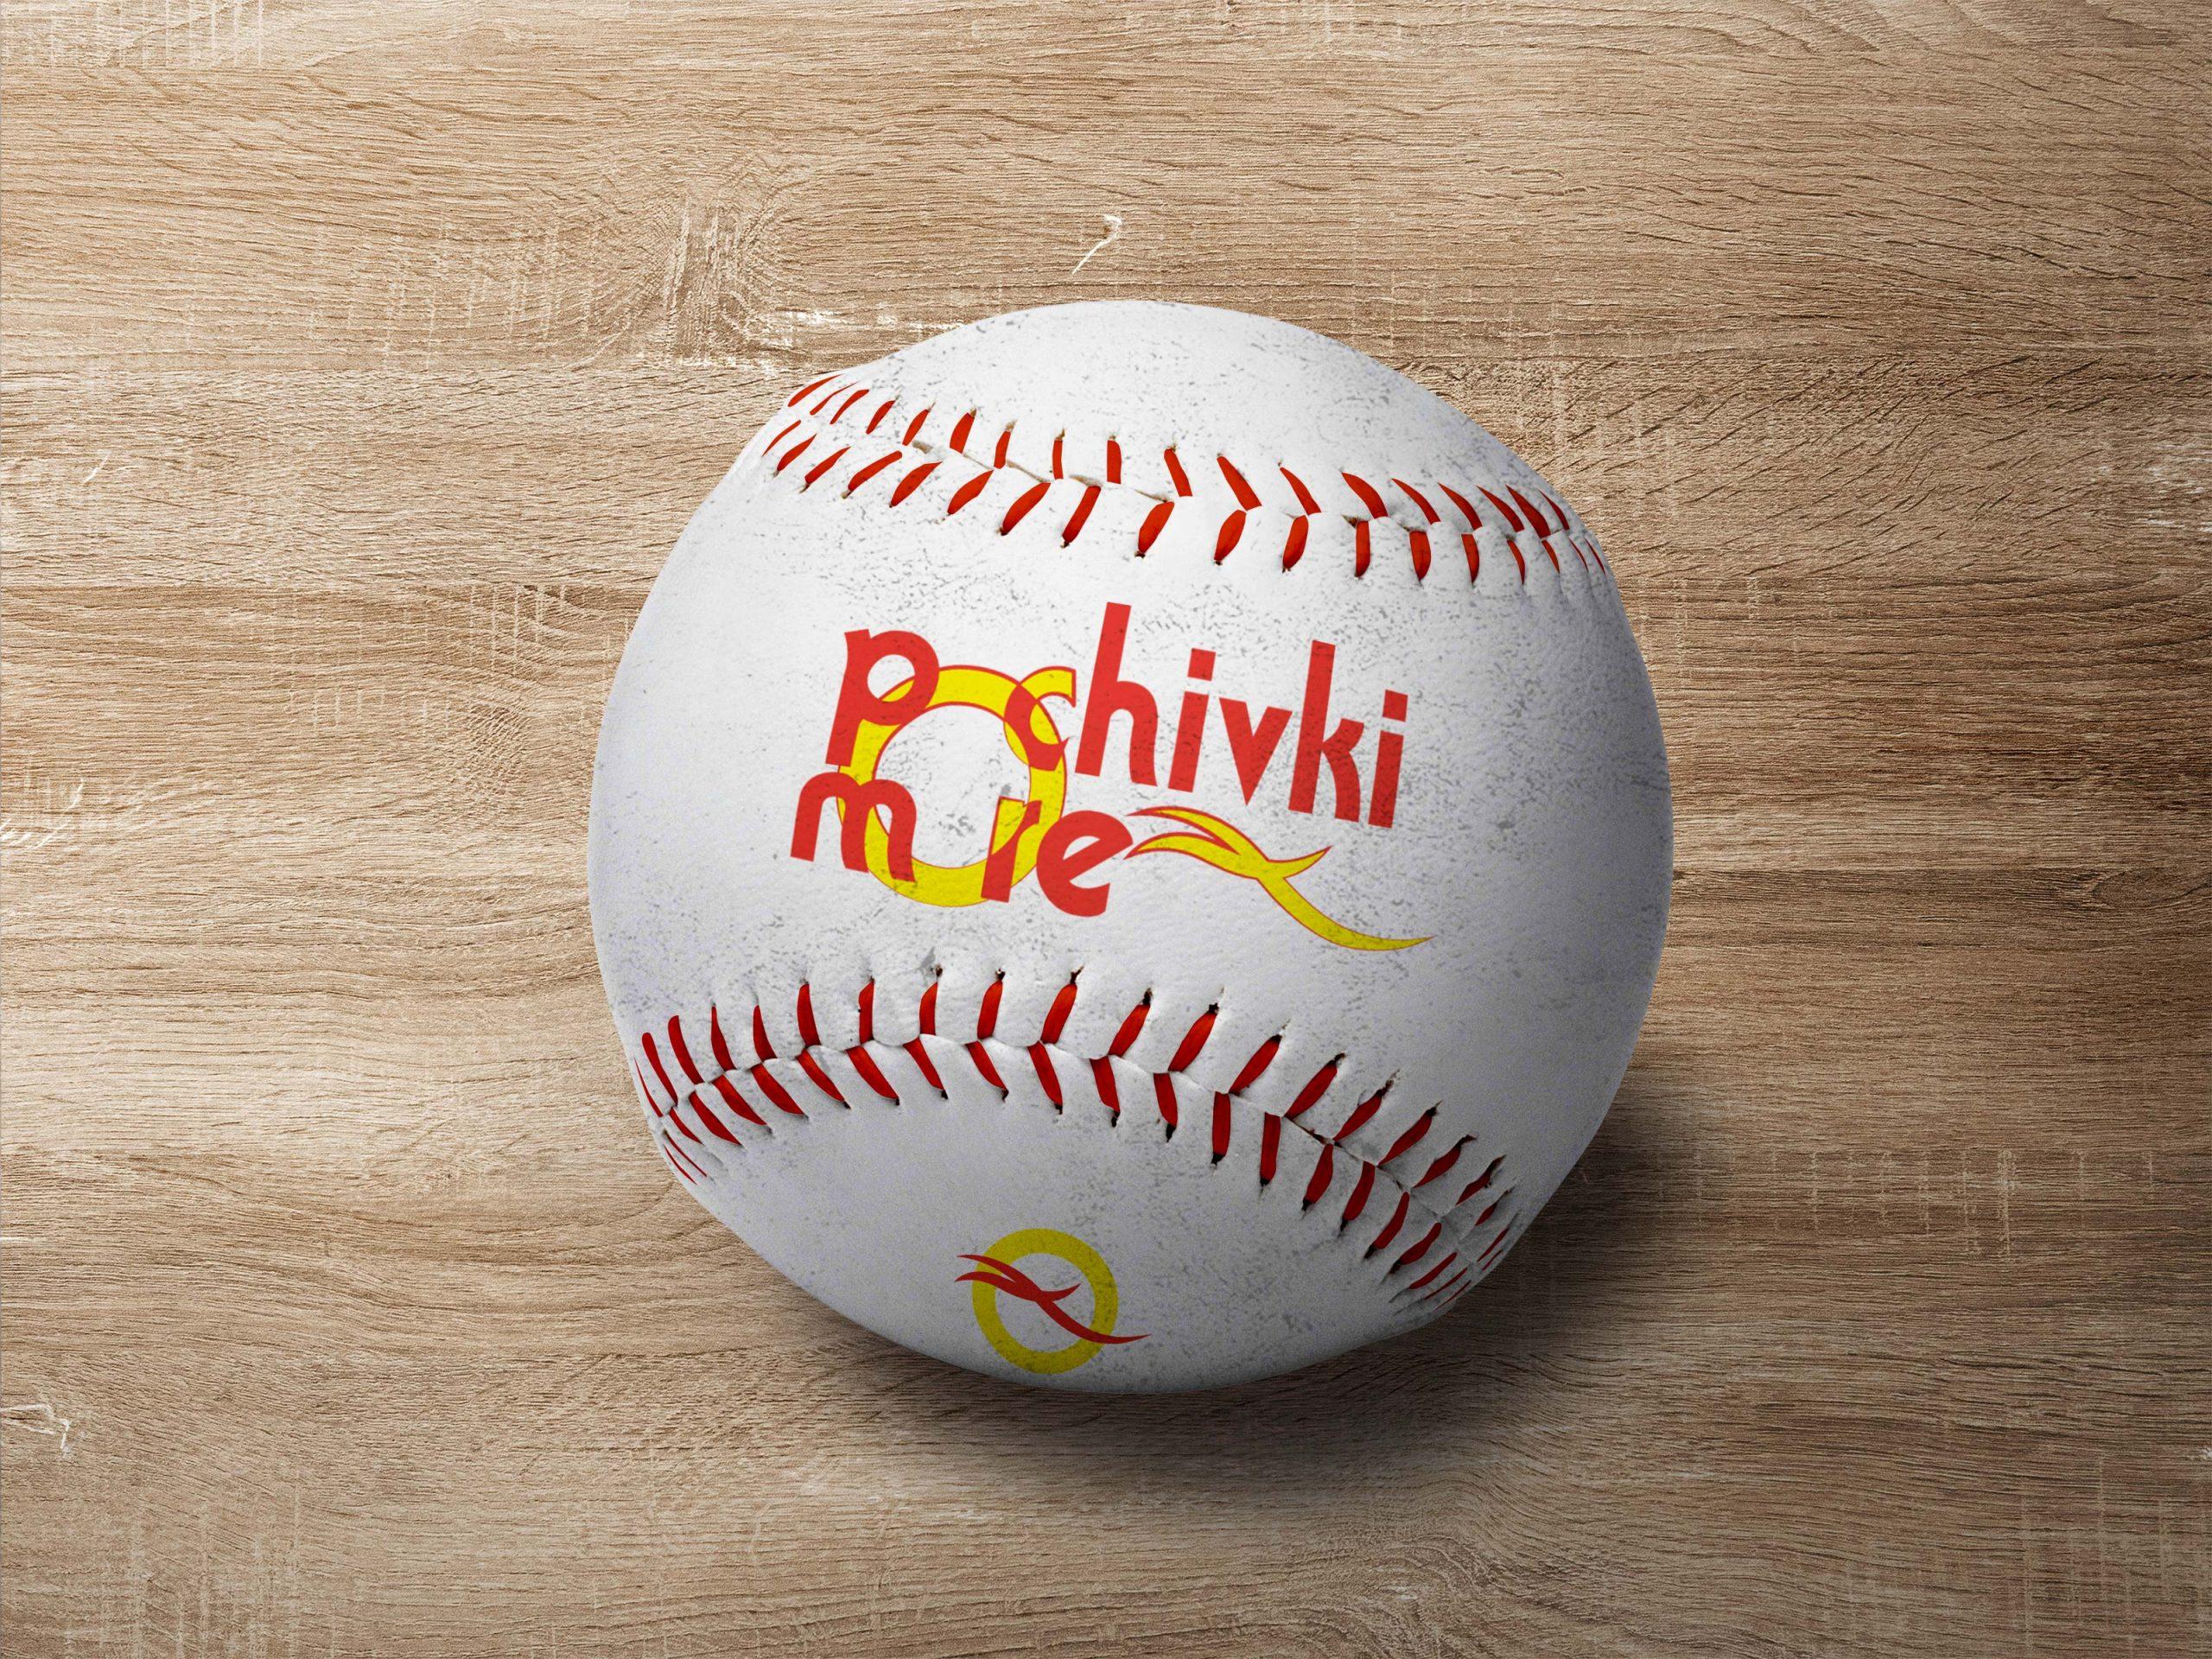 Baseball-pochivka more LOGO